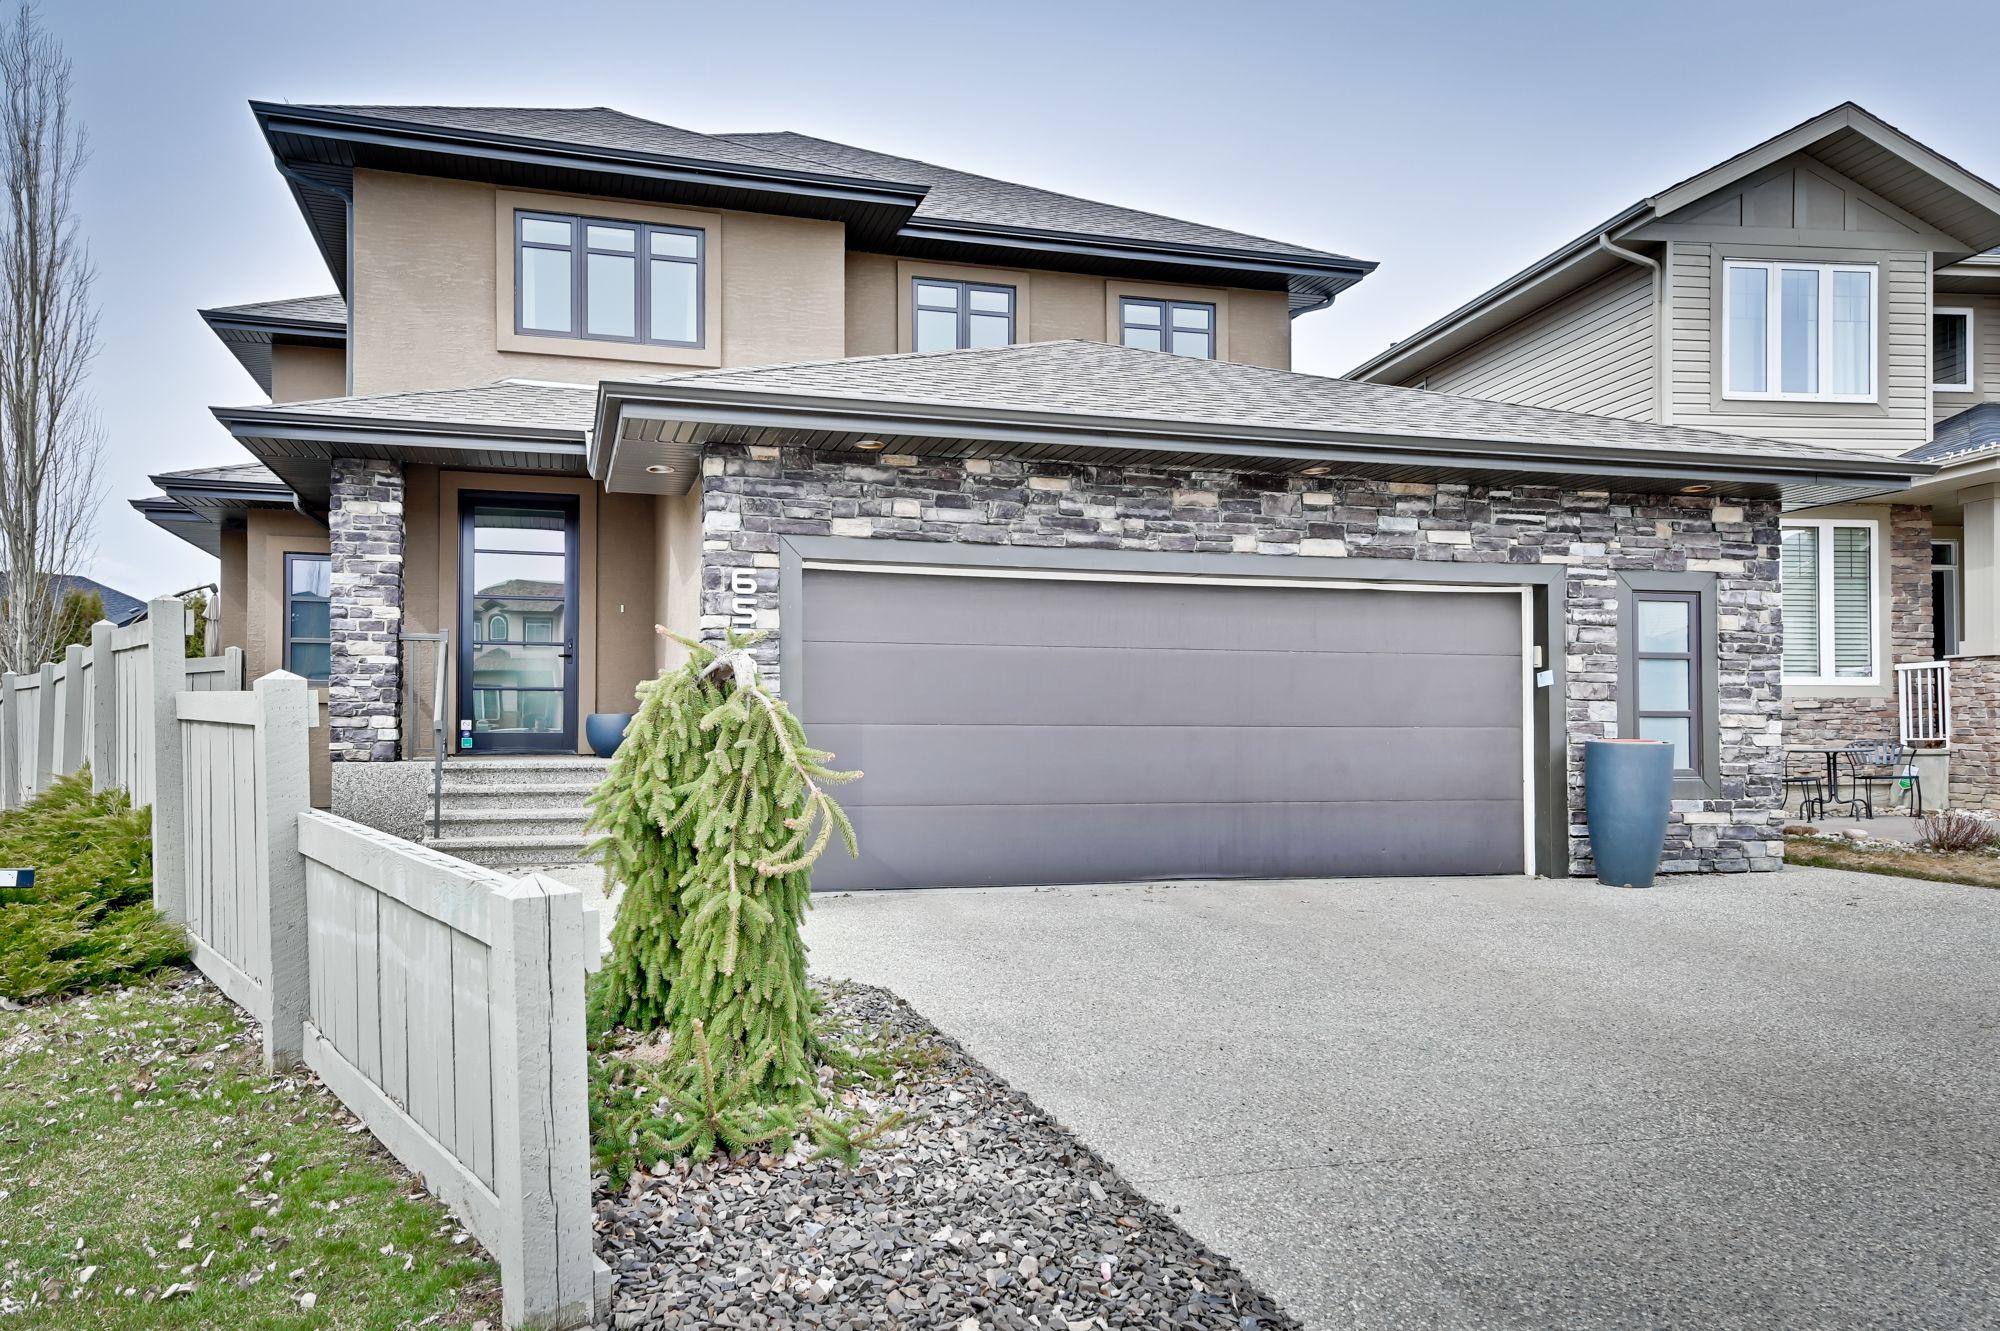 Main Photo: 6520 Mann Lane in Edmonton: MacTaggart House for sale : MLS®# E4153224